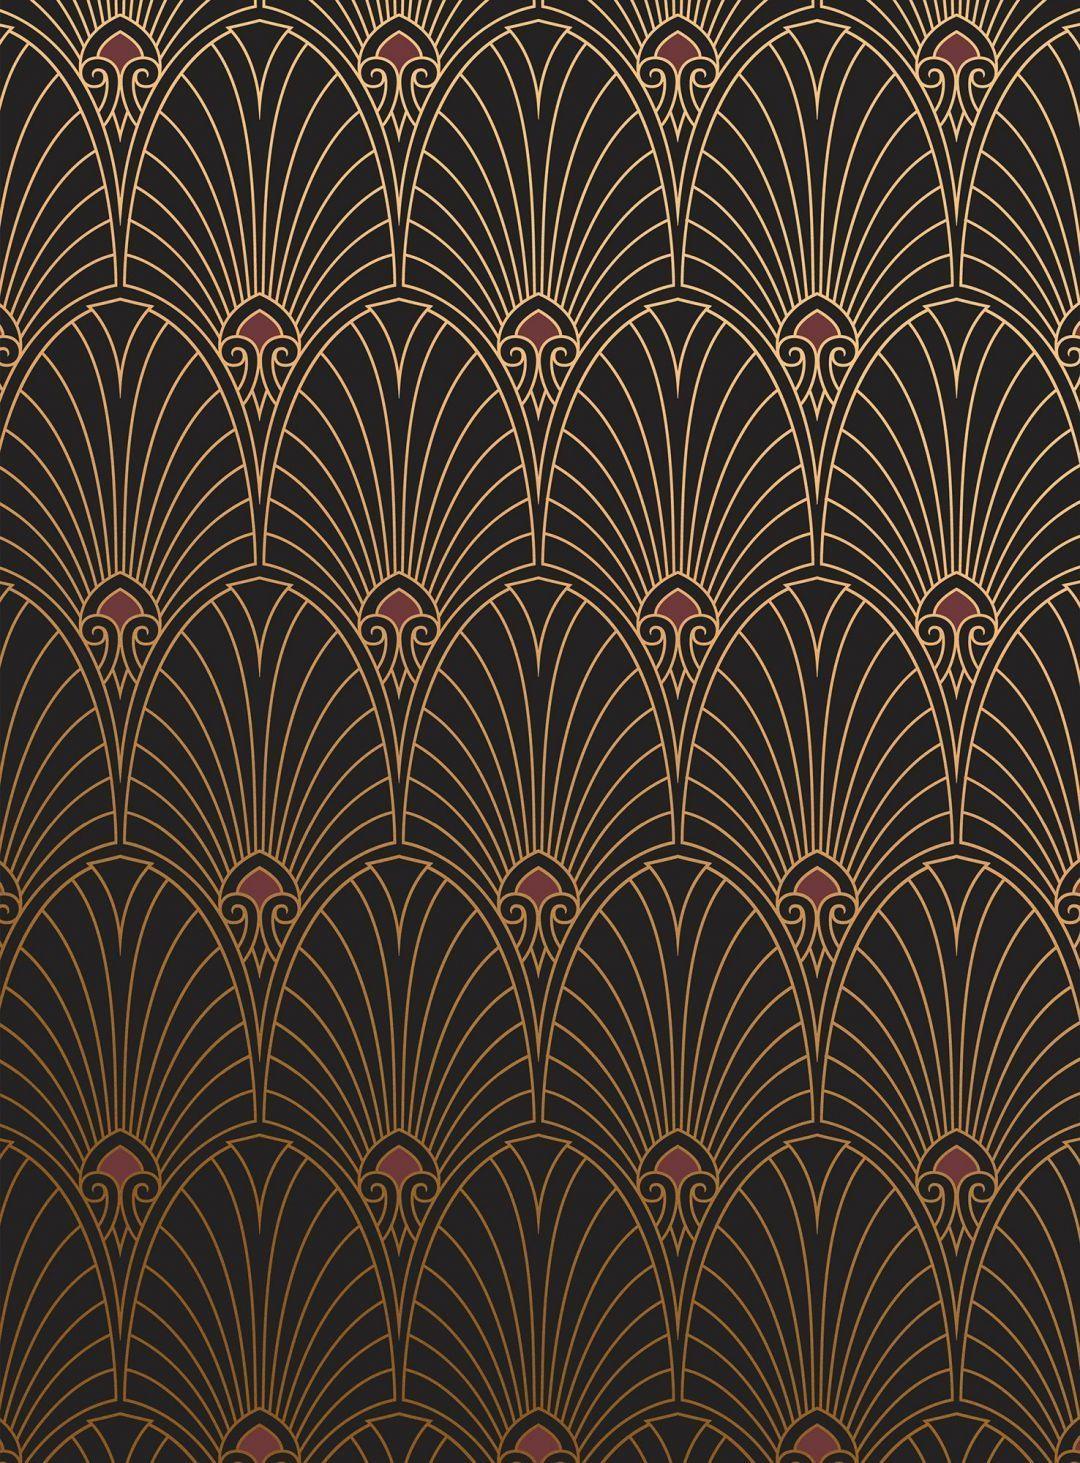 Art Nouveau Android Iphone Desktop Hd Backgrounds Wallpapers 1080p 4k 109961 Hdwallpapers And Art Deco Wallpaper Art Deco Interior 1920s Art Deco